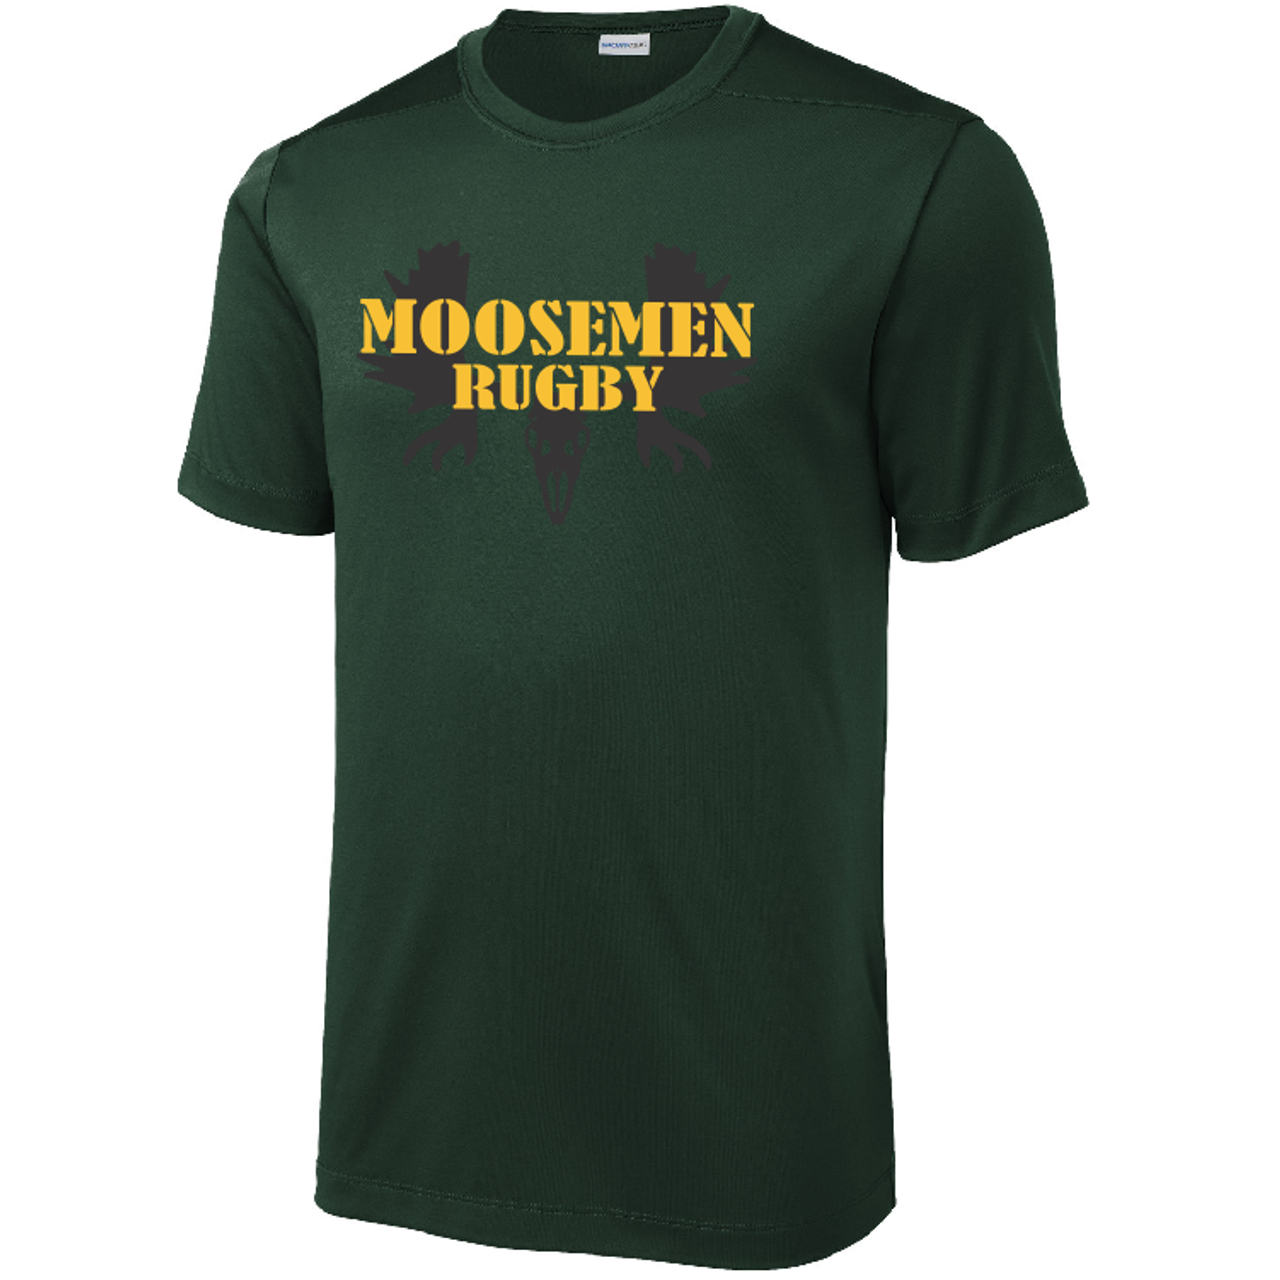 Moosemen Rugby Performance T-Shirt